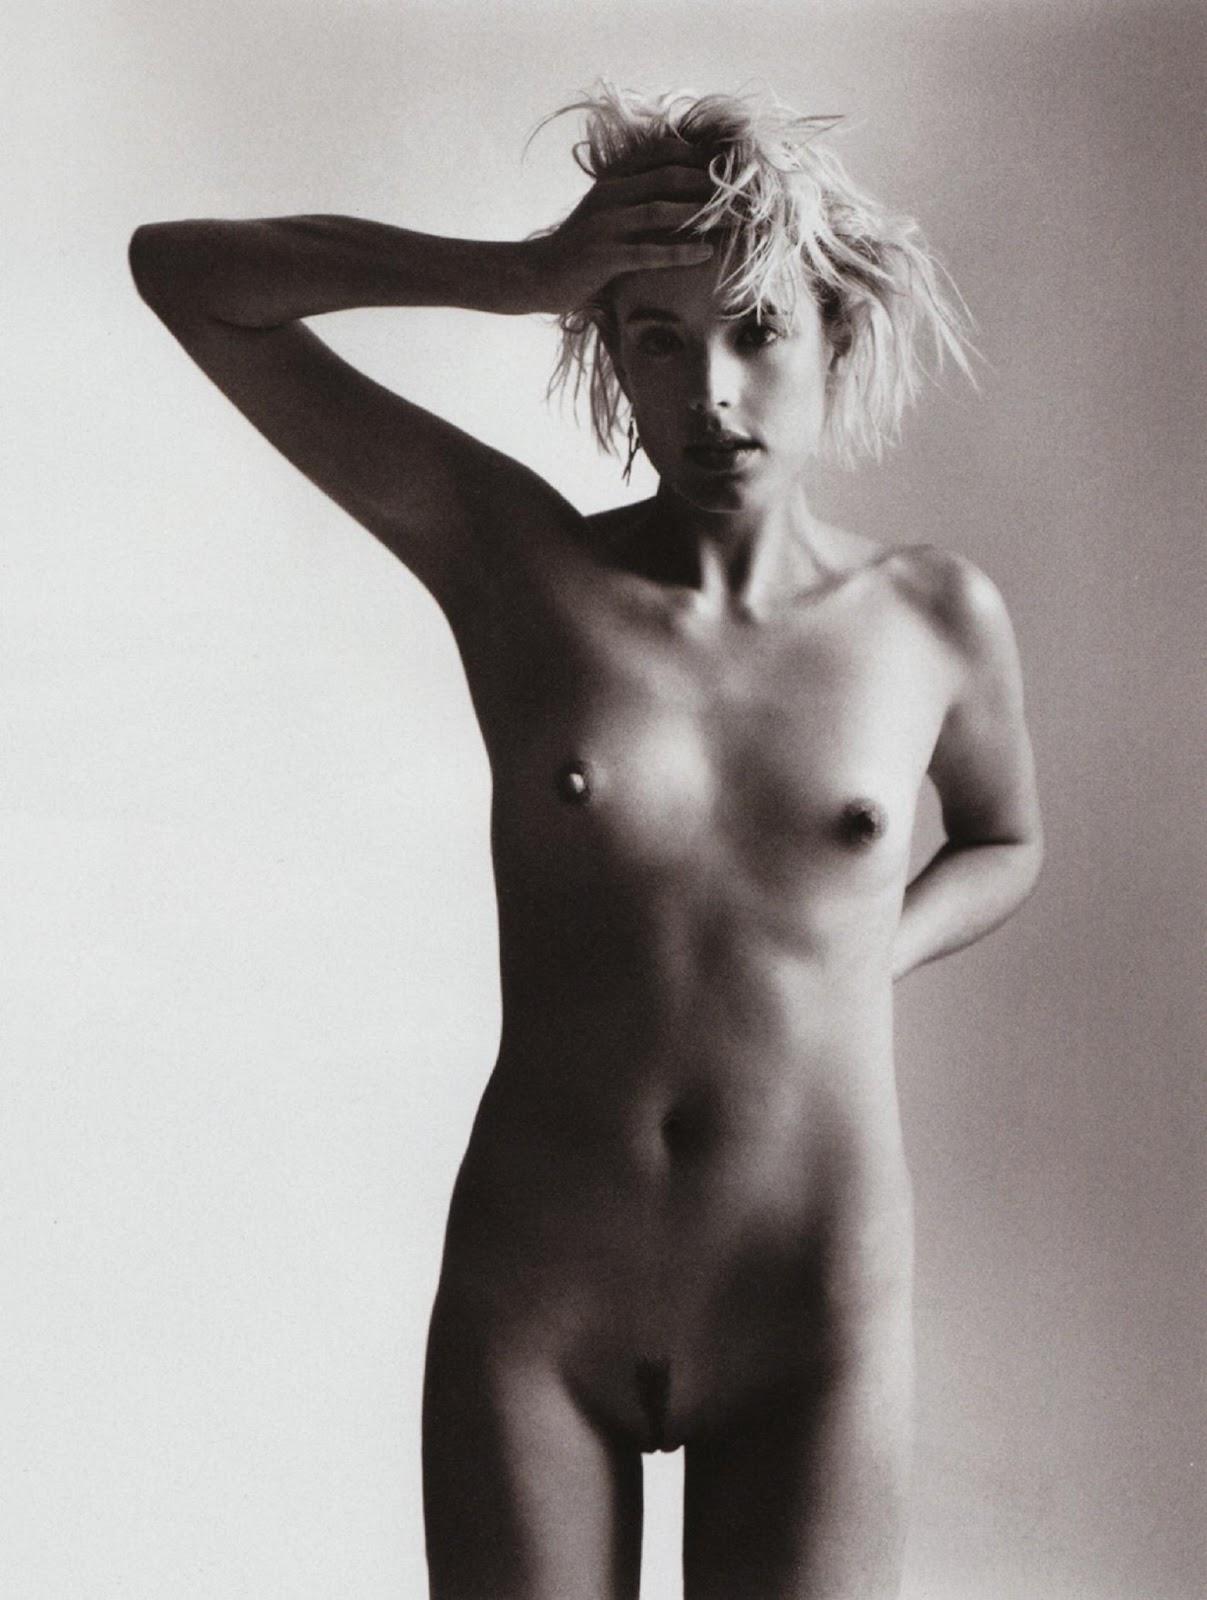 Supermodel Agyness Deyn's Nude Fire Escape Photoshoot